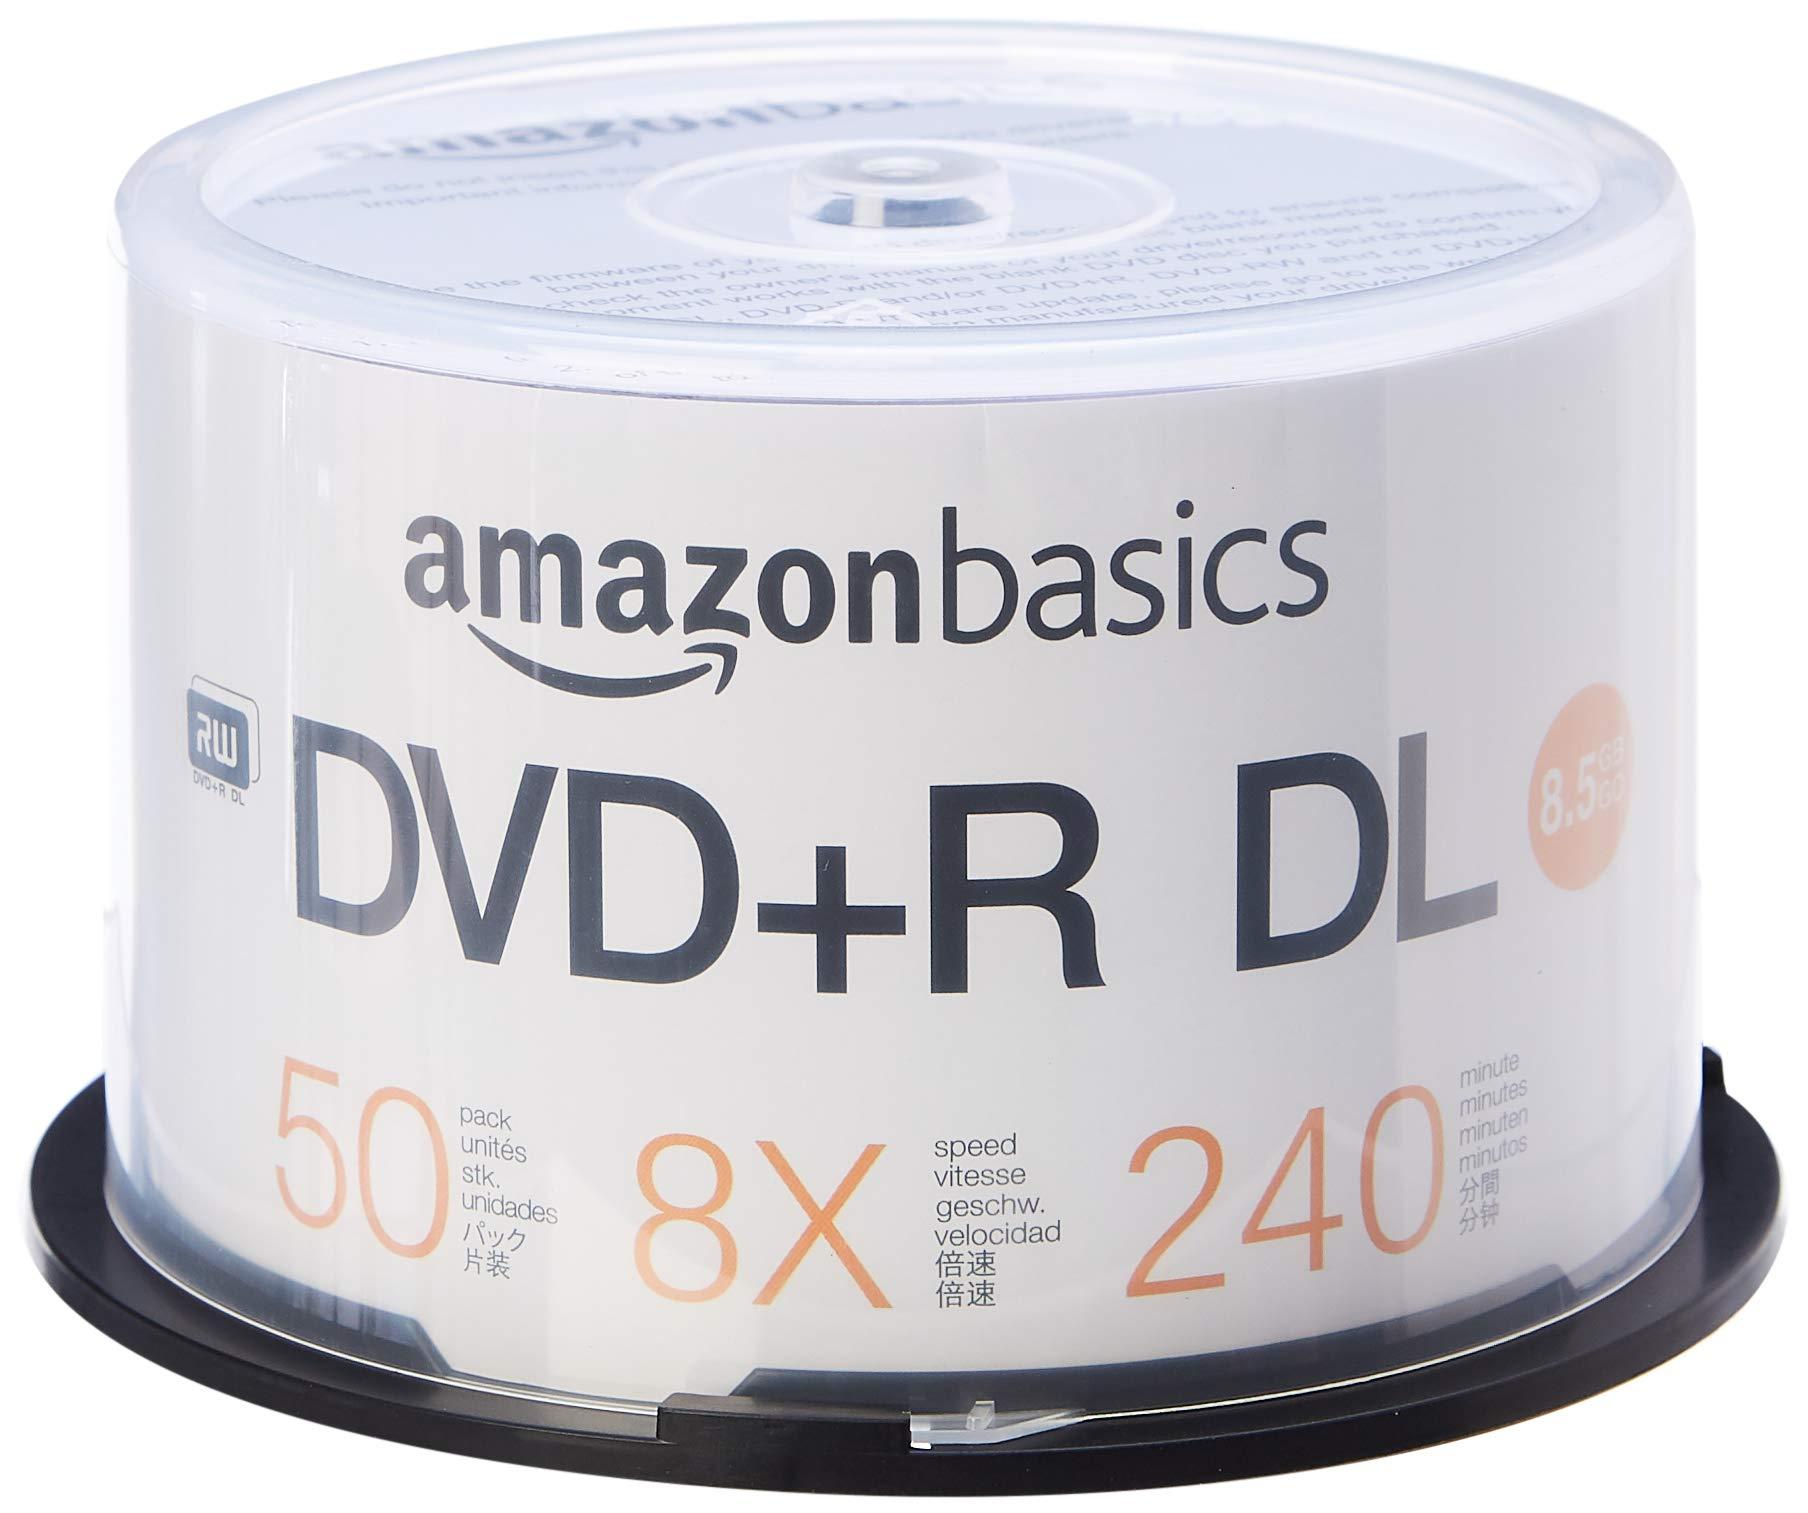 AmazonBasics 8.5GB 8x DVD+R DL - 50-Pack Spindle by AmazonBasics